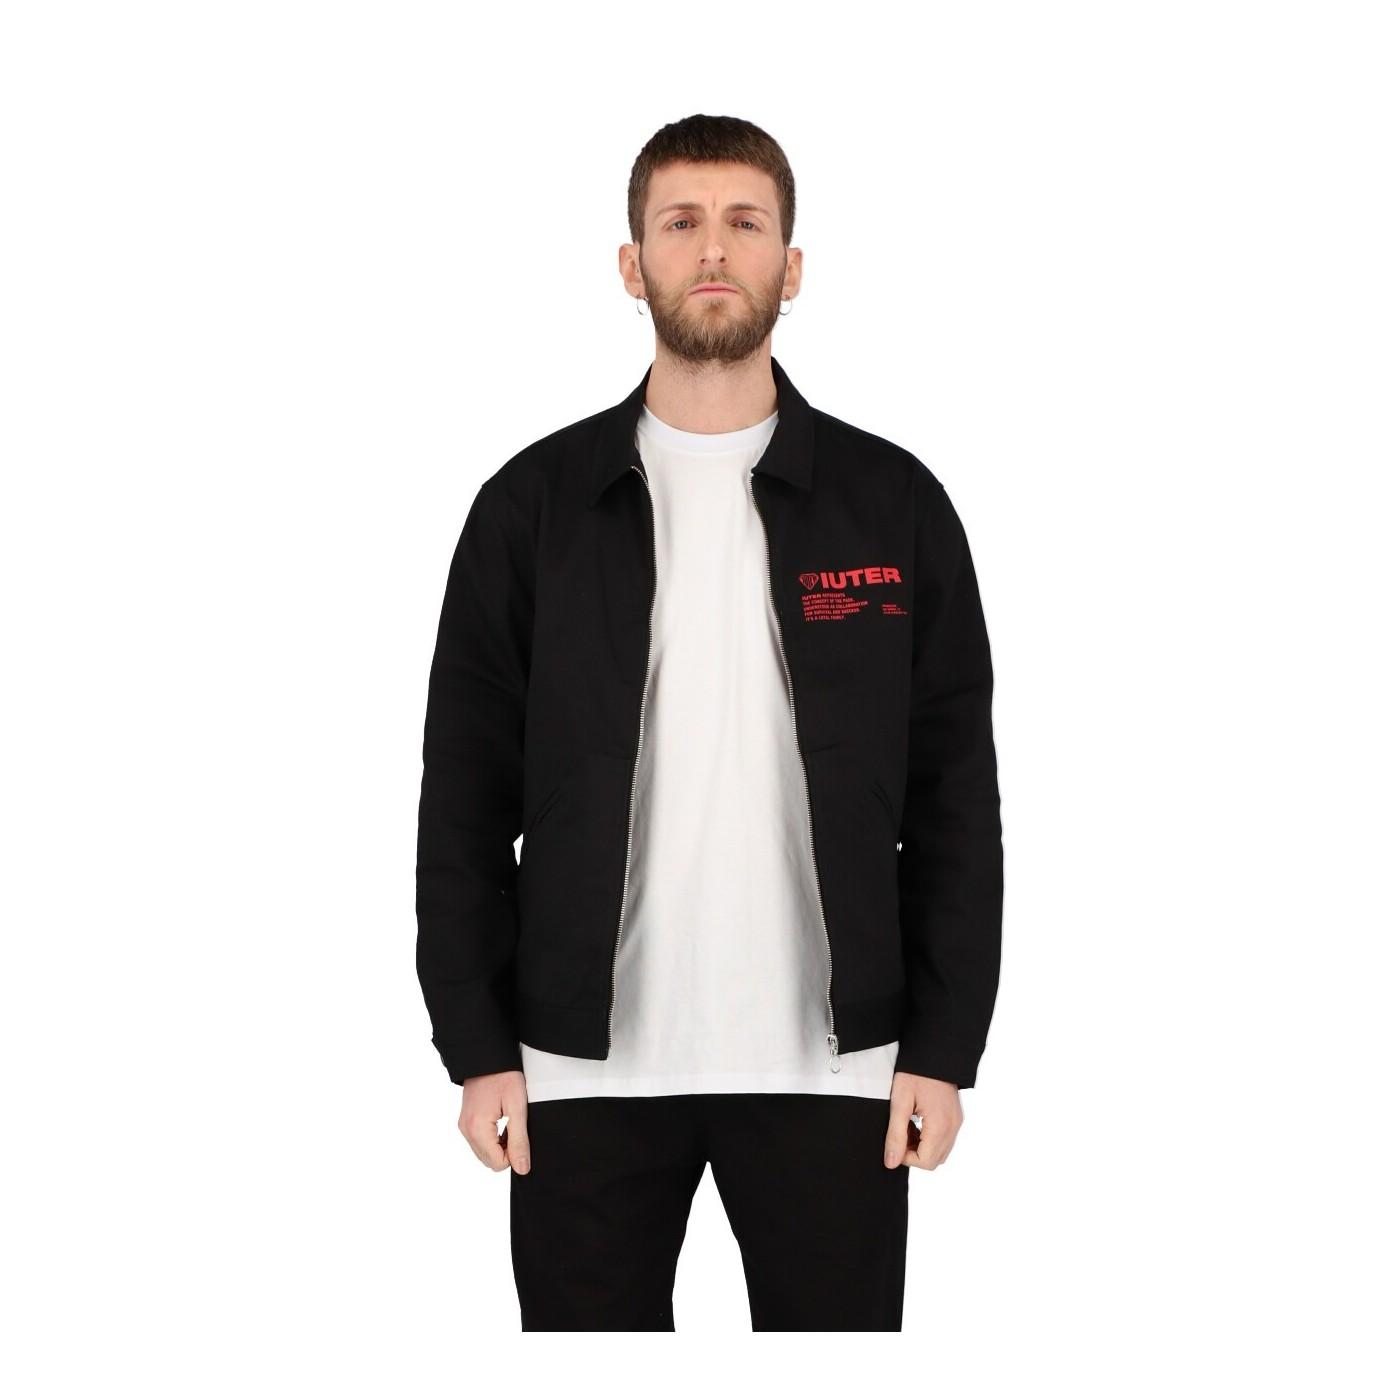 Iuter Giacca Uomo Nera Info Redford Jacket Black